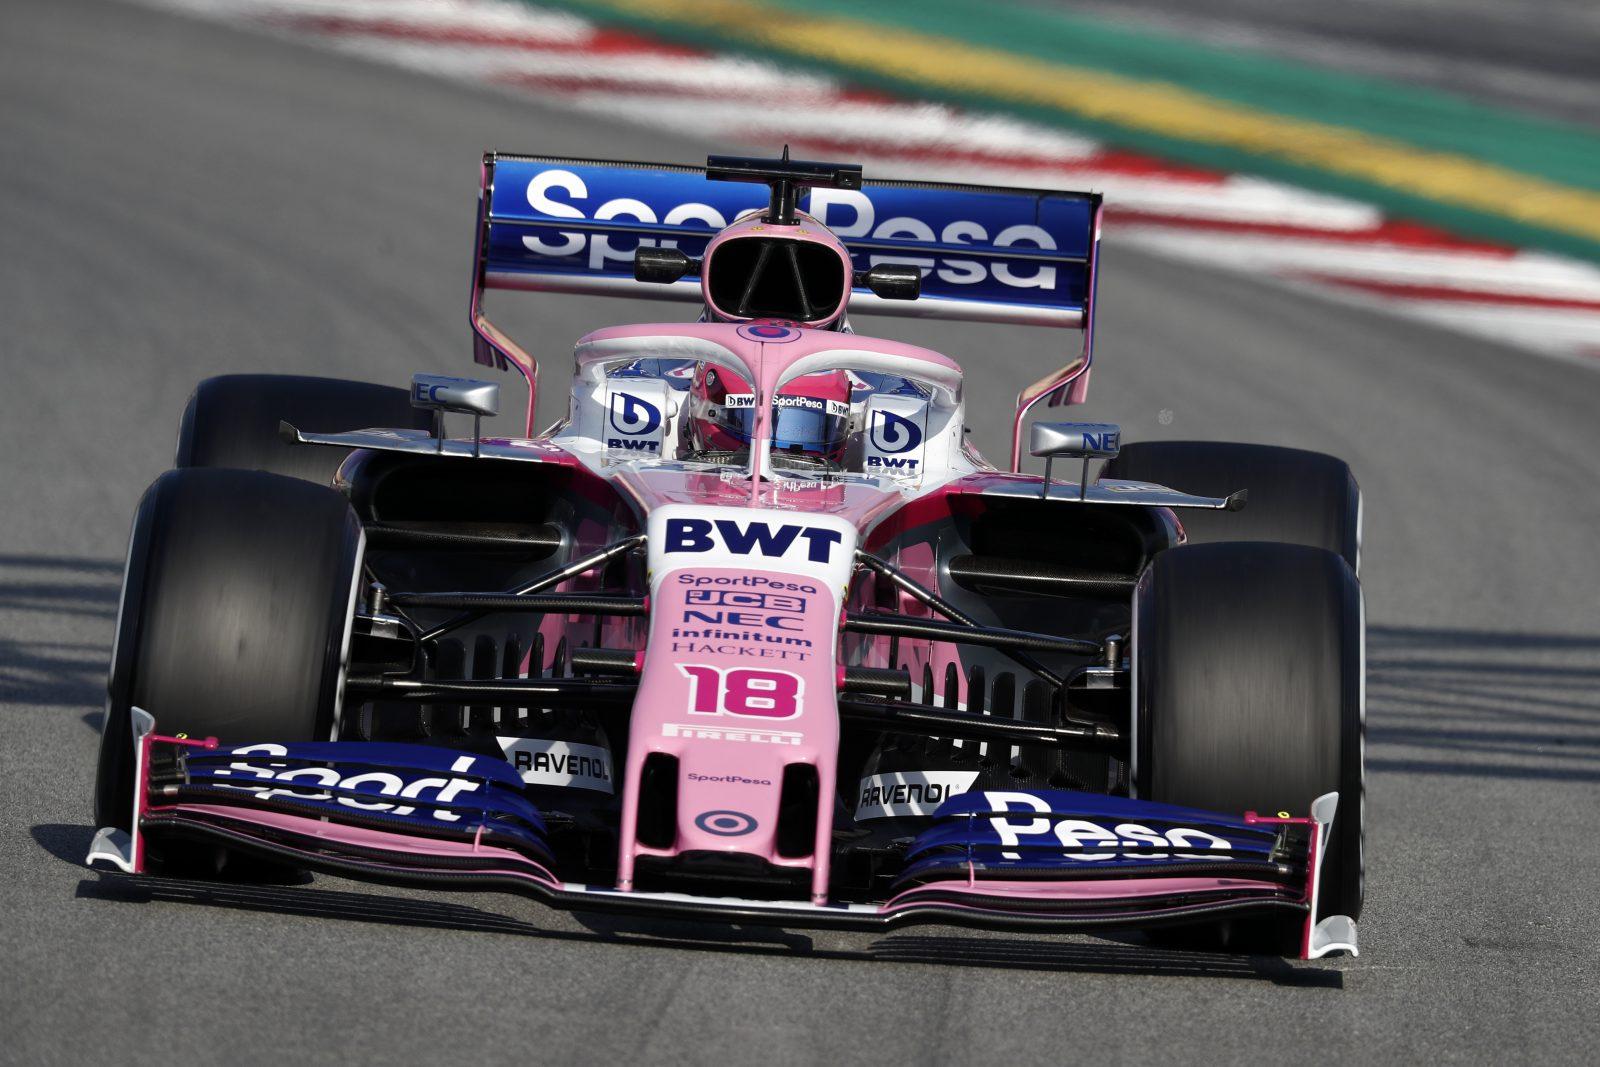 Racing Point F1 - Stroll